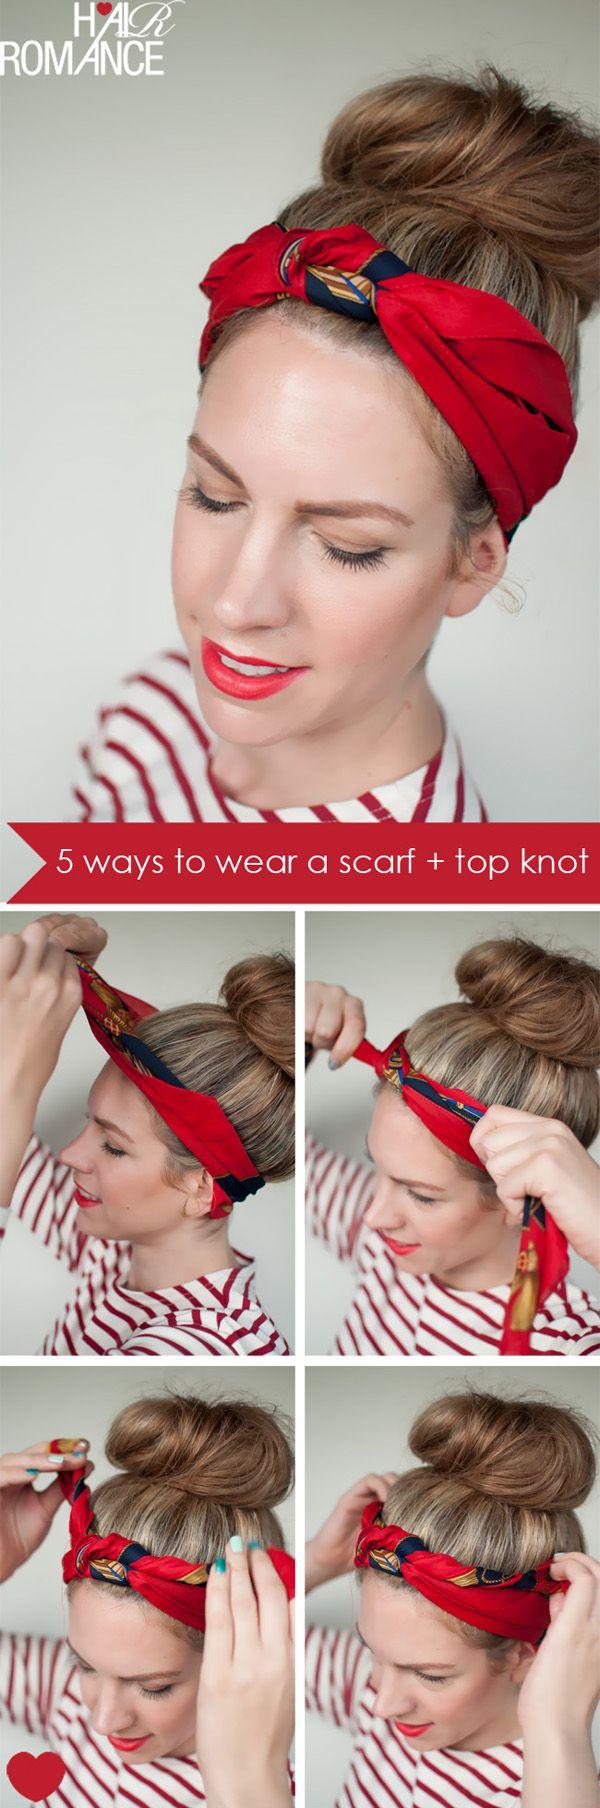 How to scarf wear headband 2019